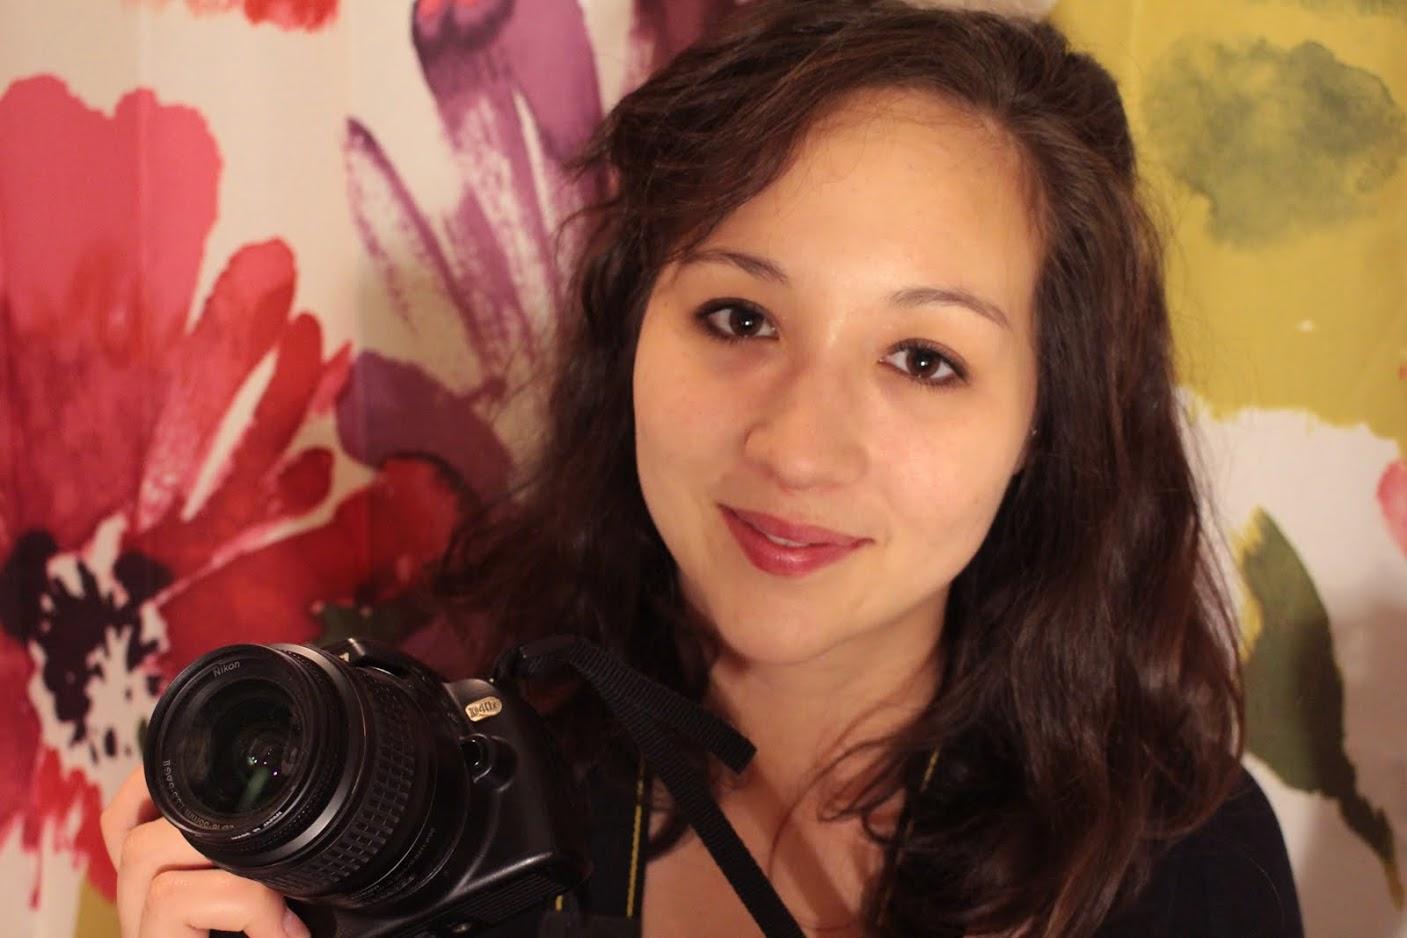 Meet Katie: Videography Intern Extraordinaire